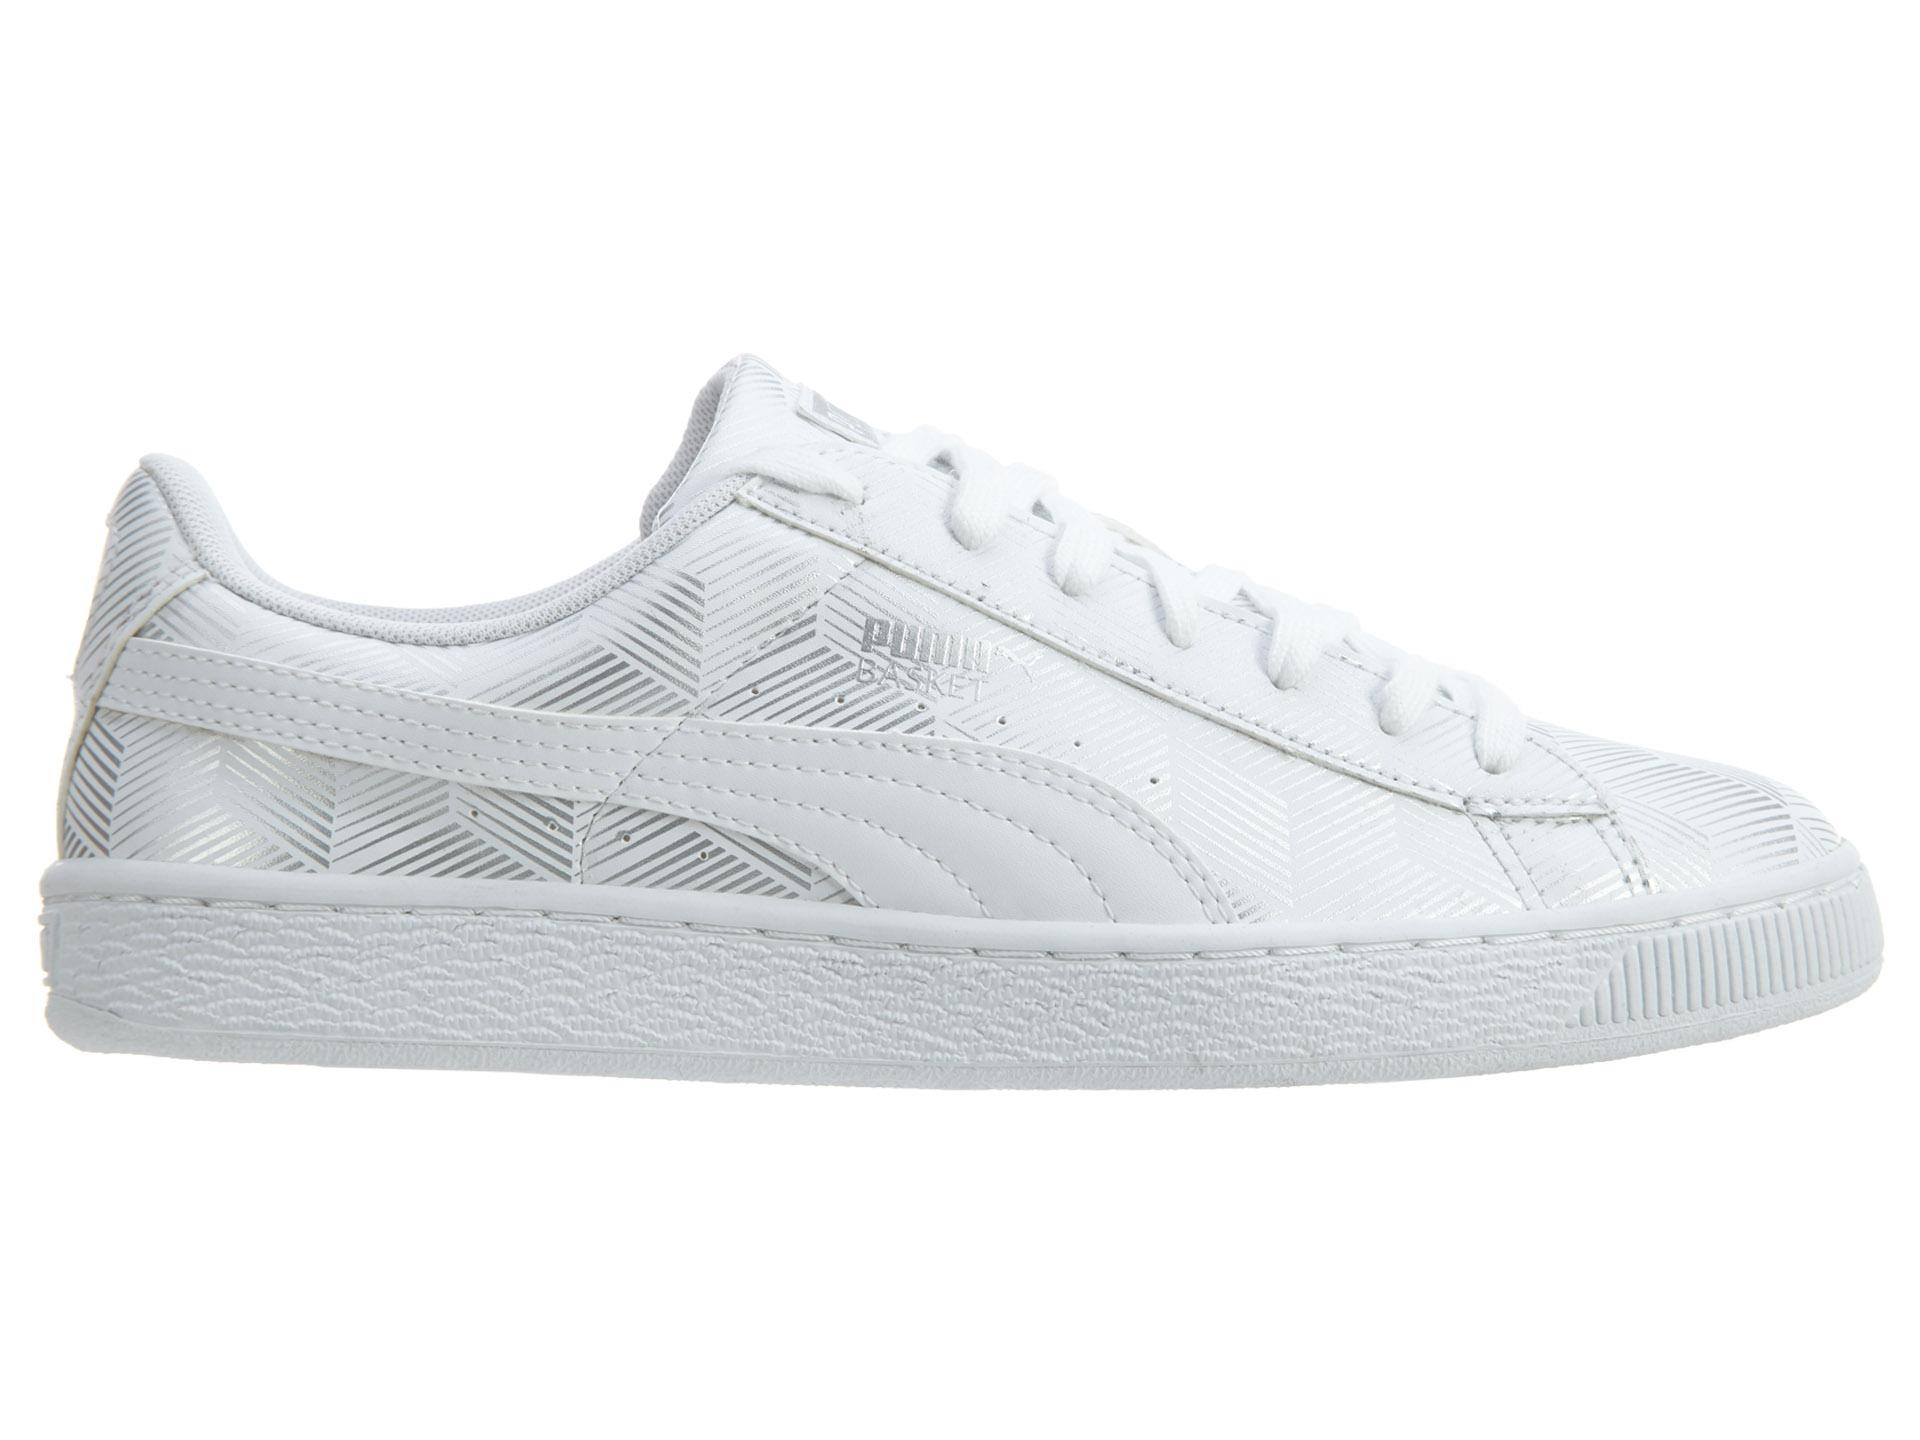 Puma Basket Classic White - 361069